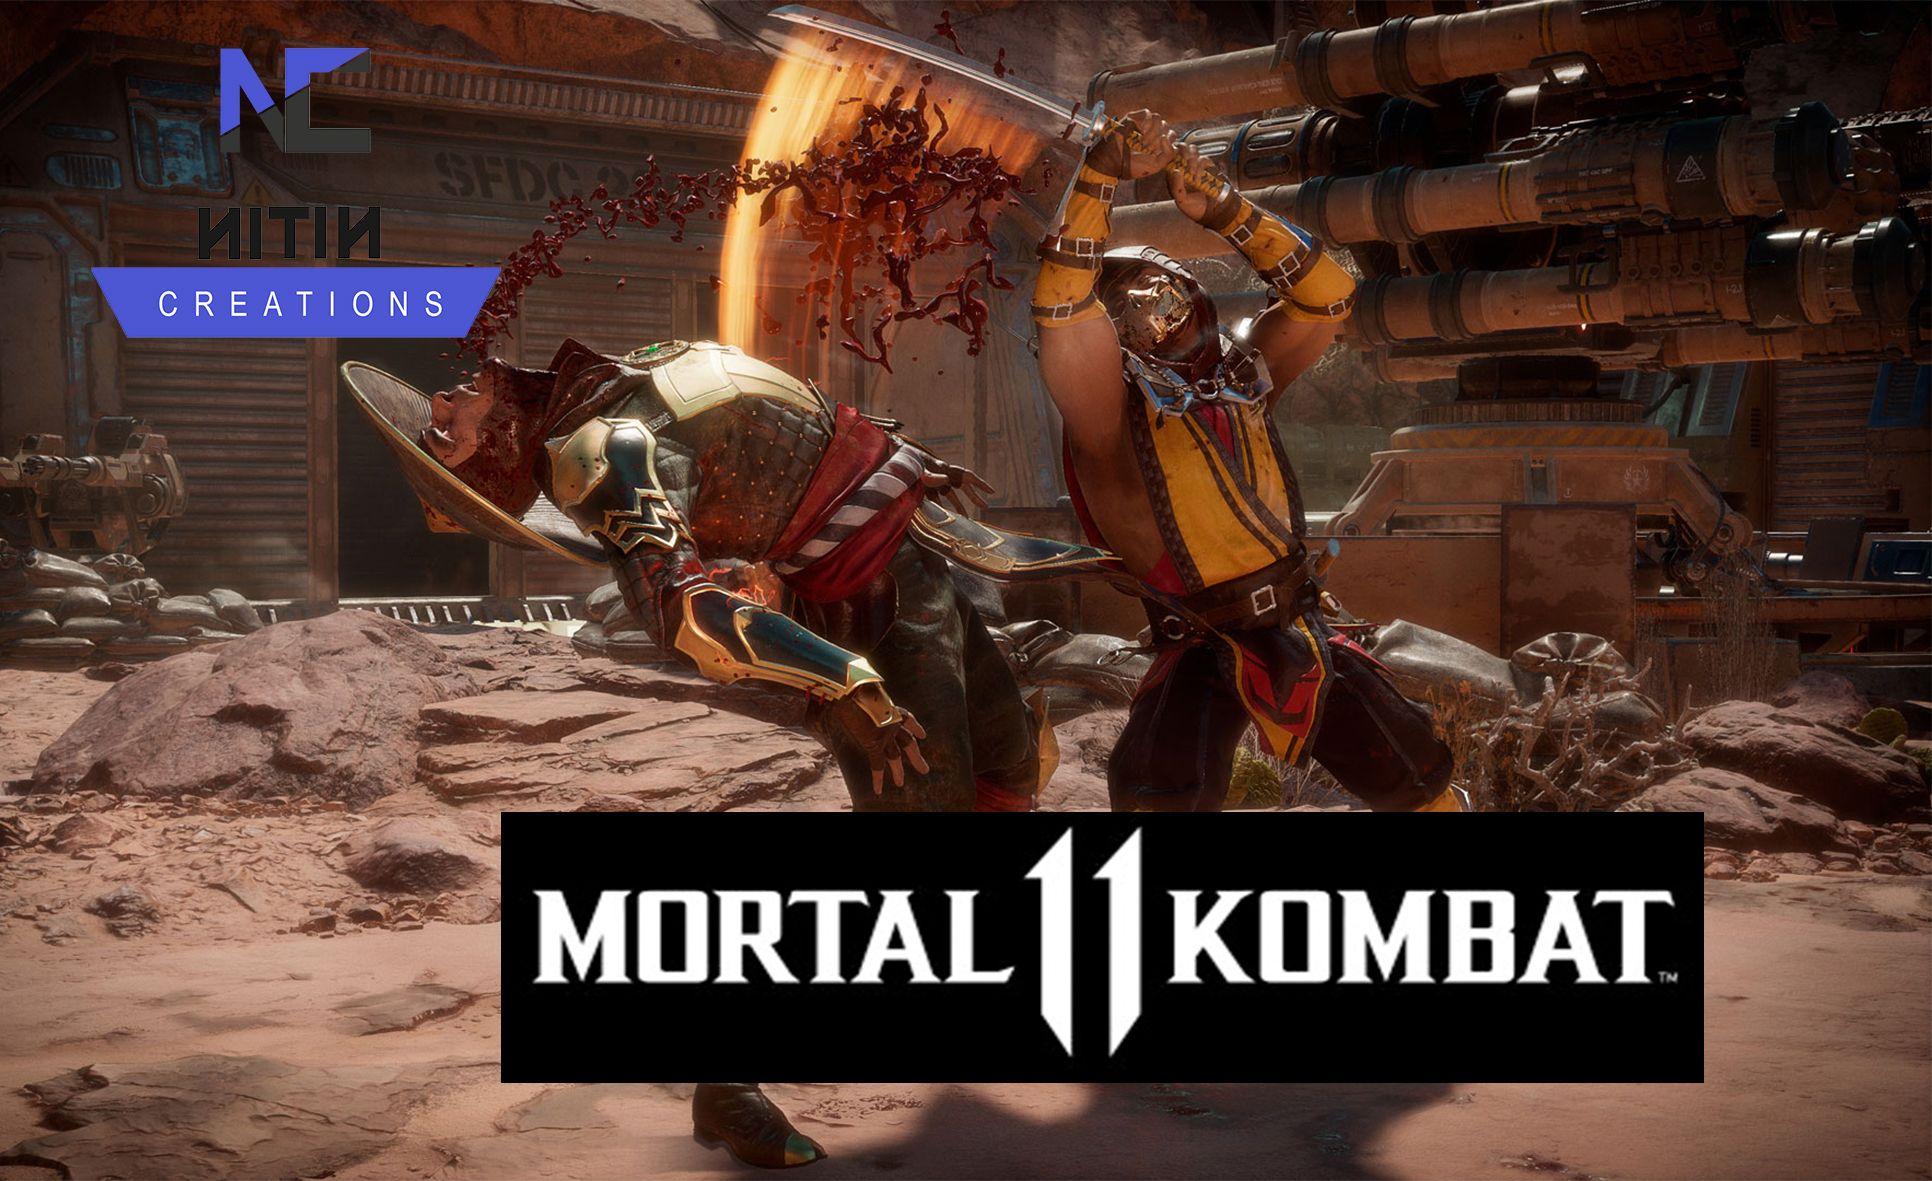 Mortal Kombat 11 Premium Edition and Royale Pass, Gameplay